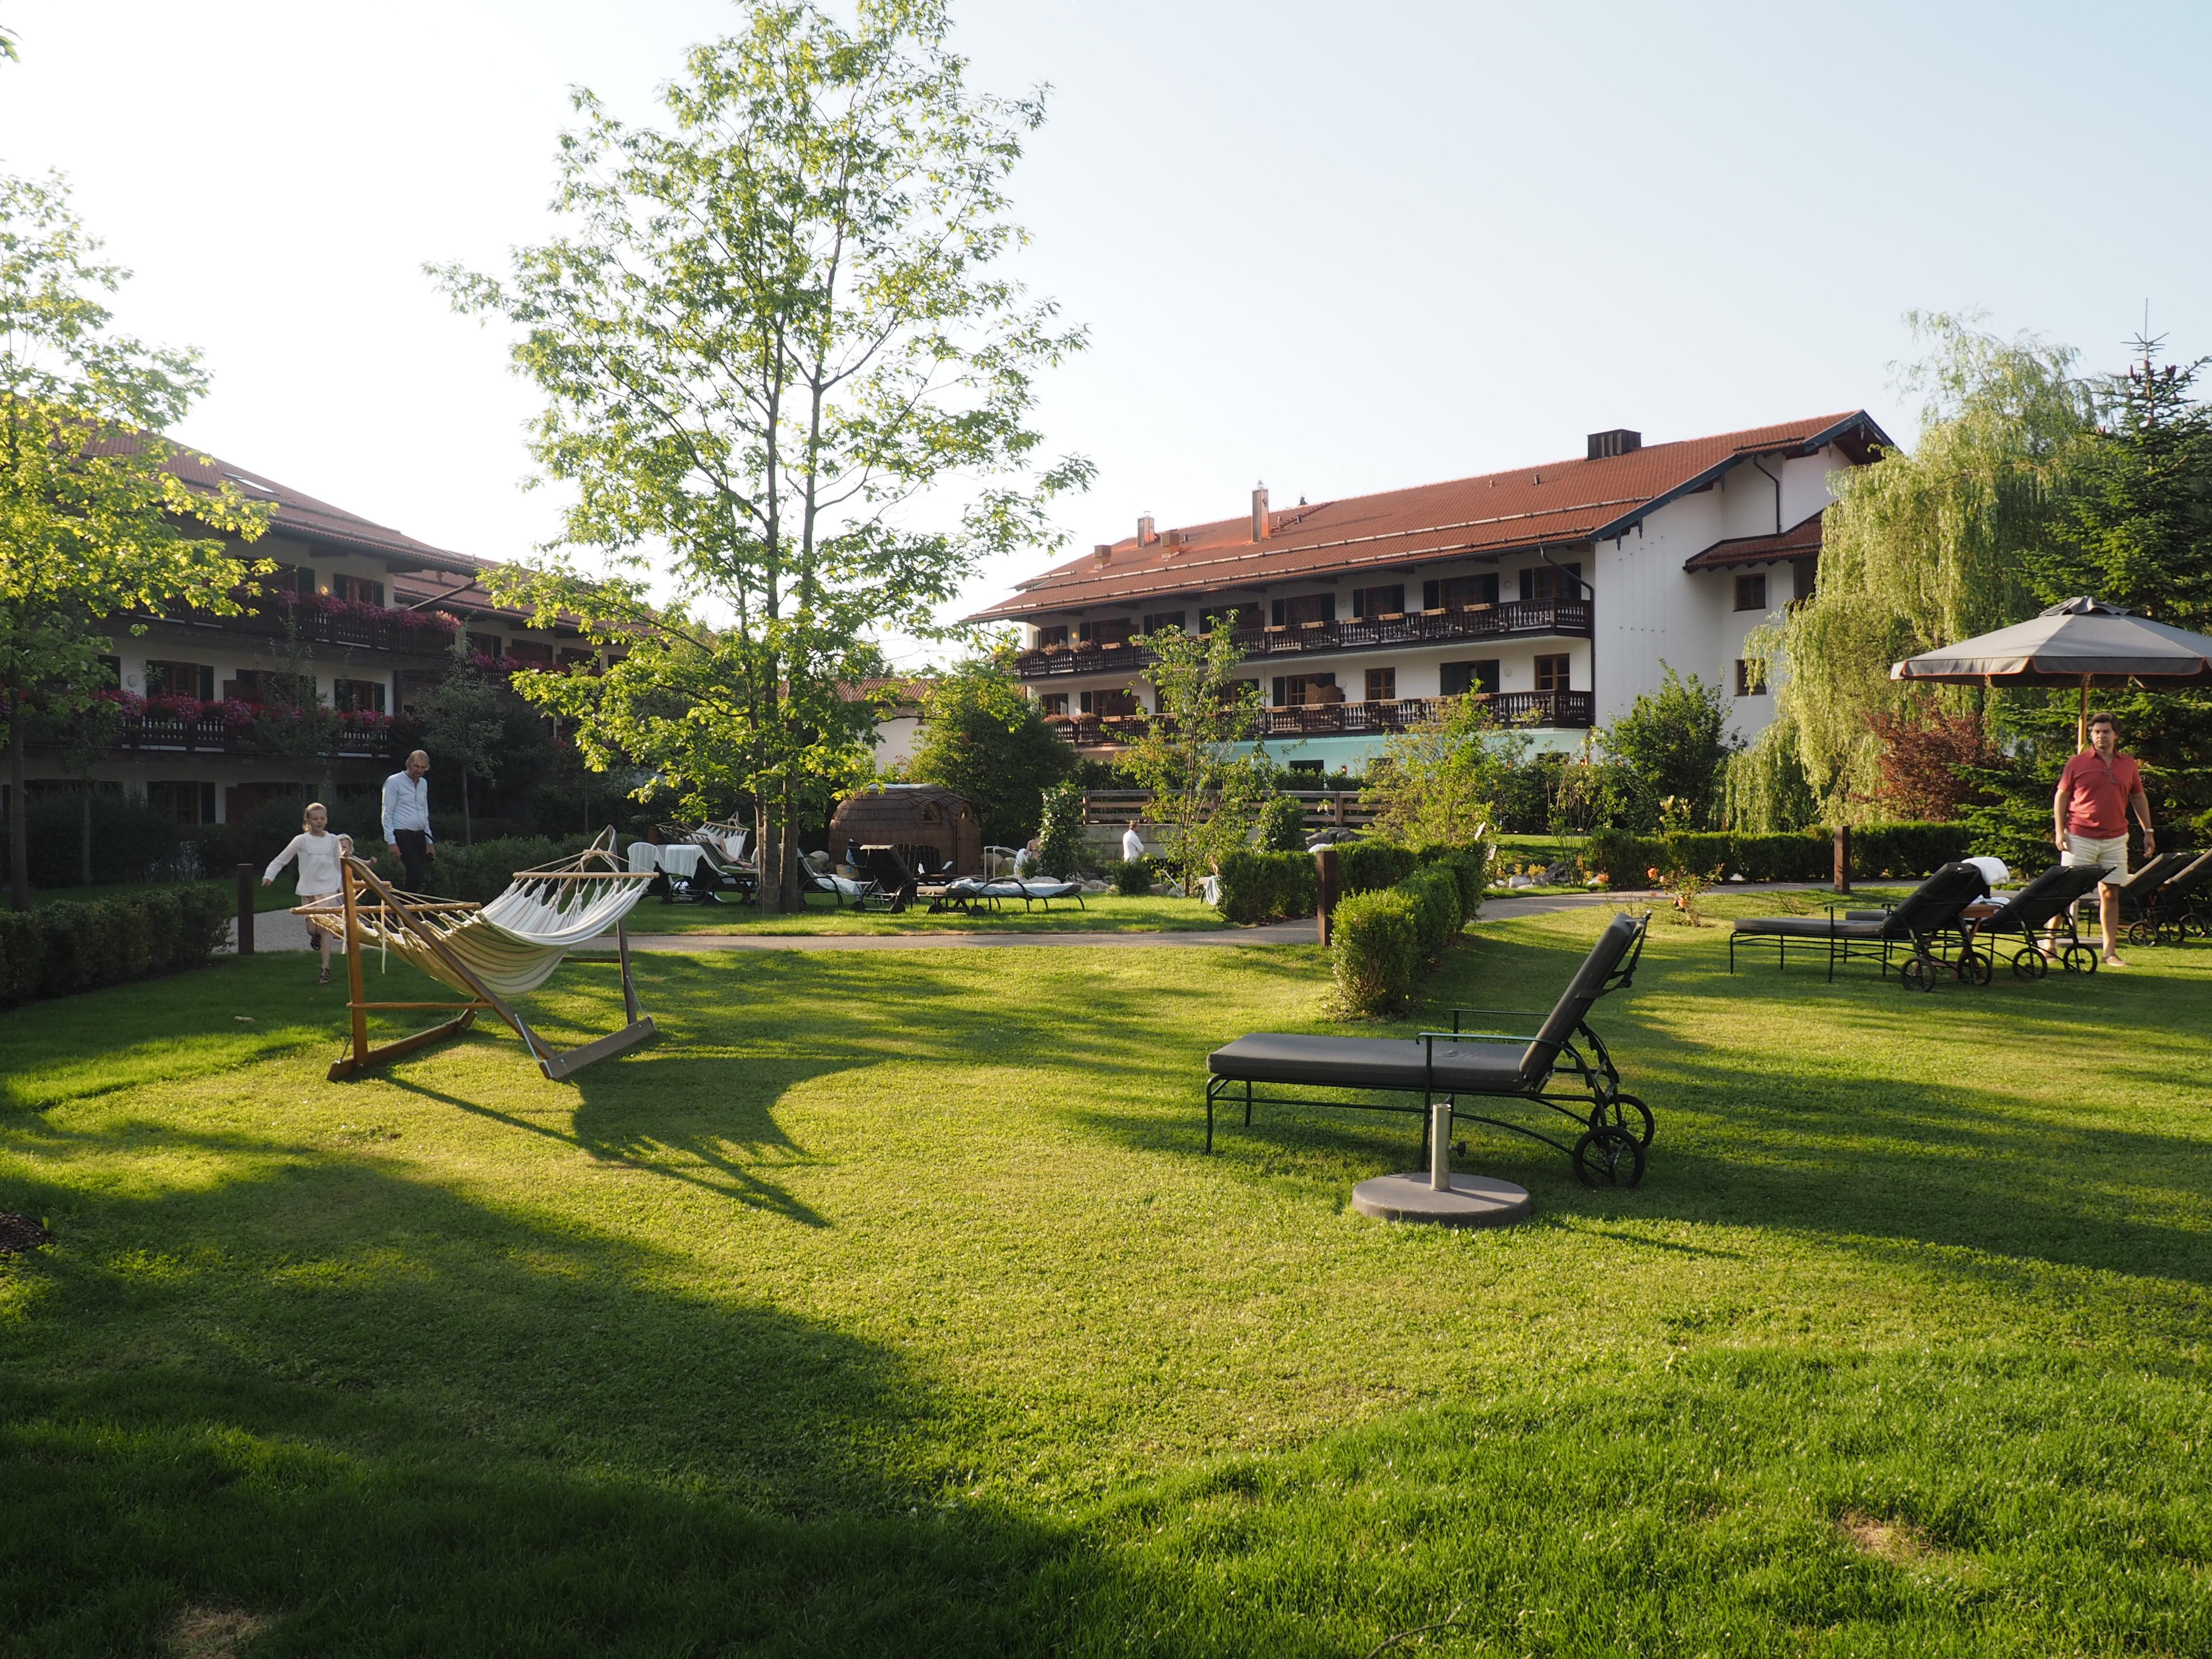 Hotel Bachmair Weissach Tegernsee - KIM ENGEL